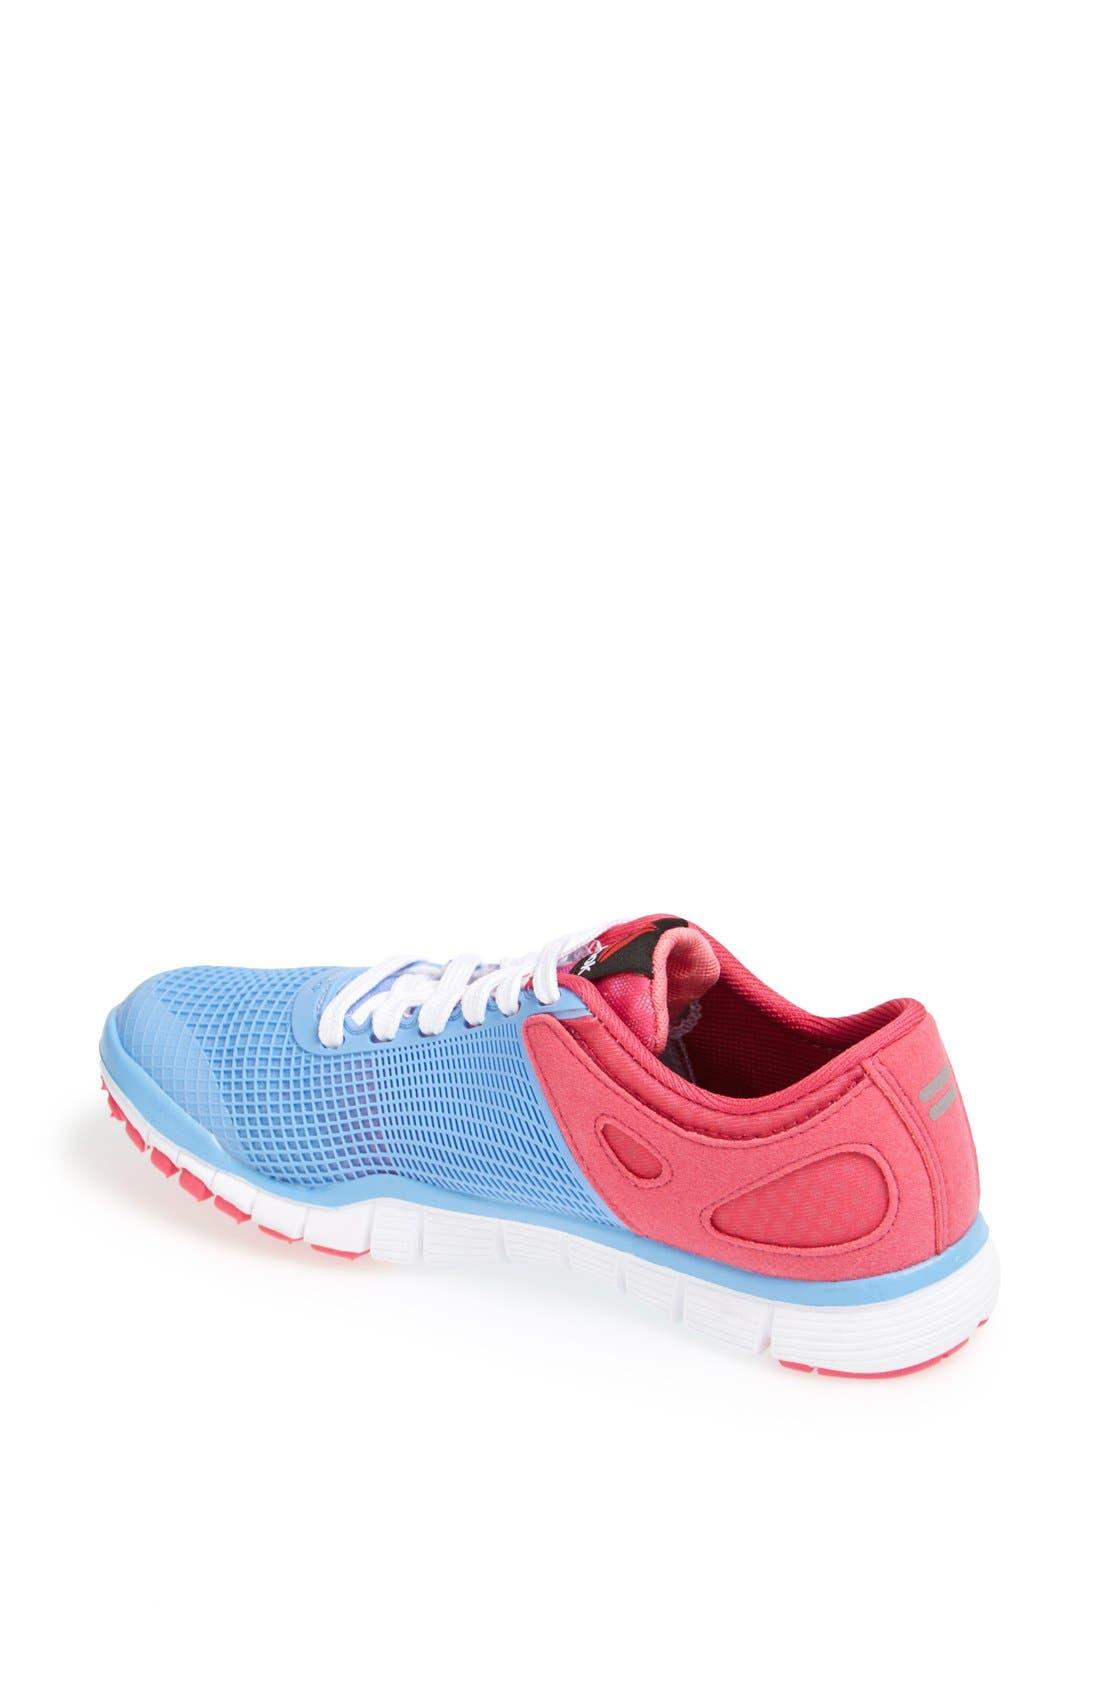 Alternate Image 2  - Reebok 'Quick' Training Shoes (Women)